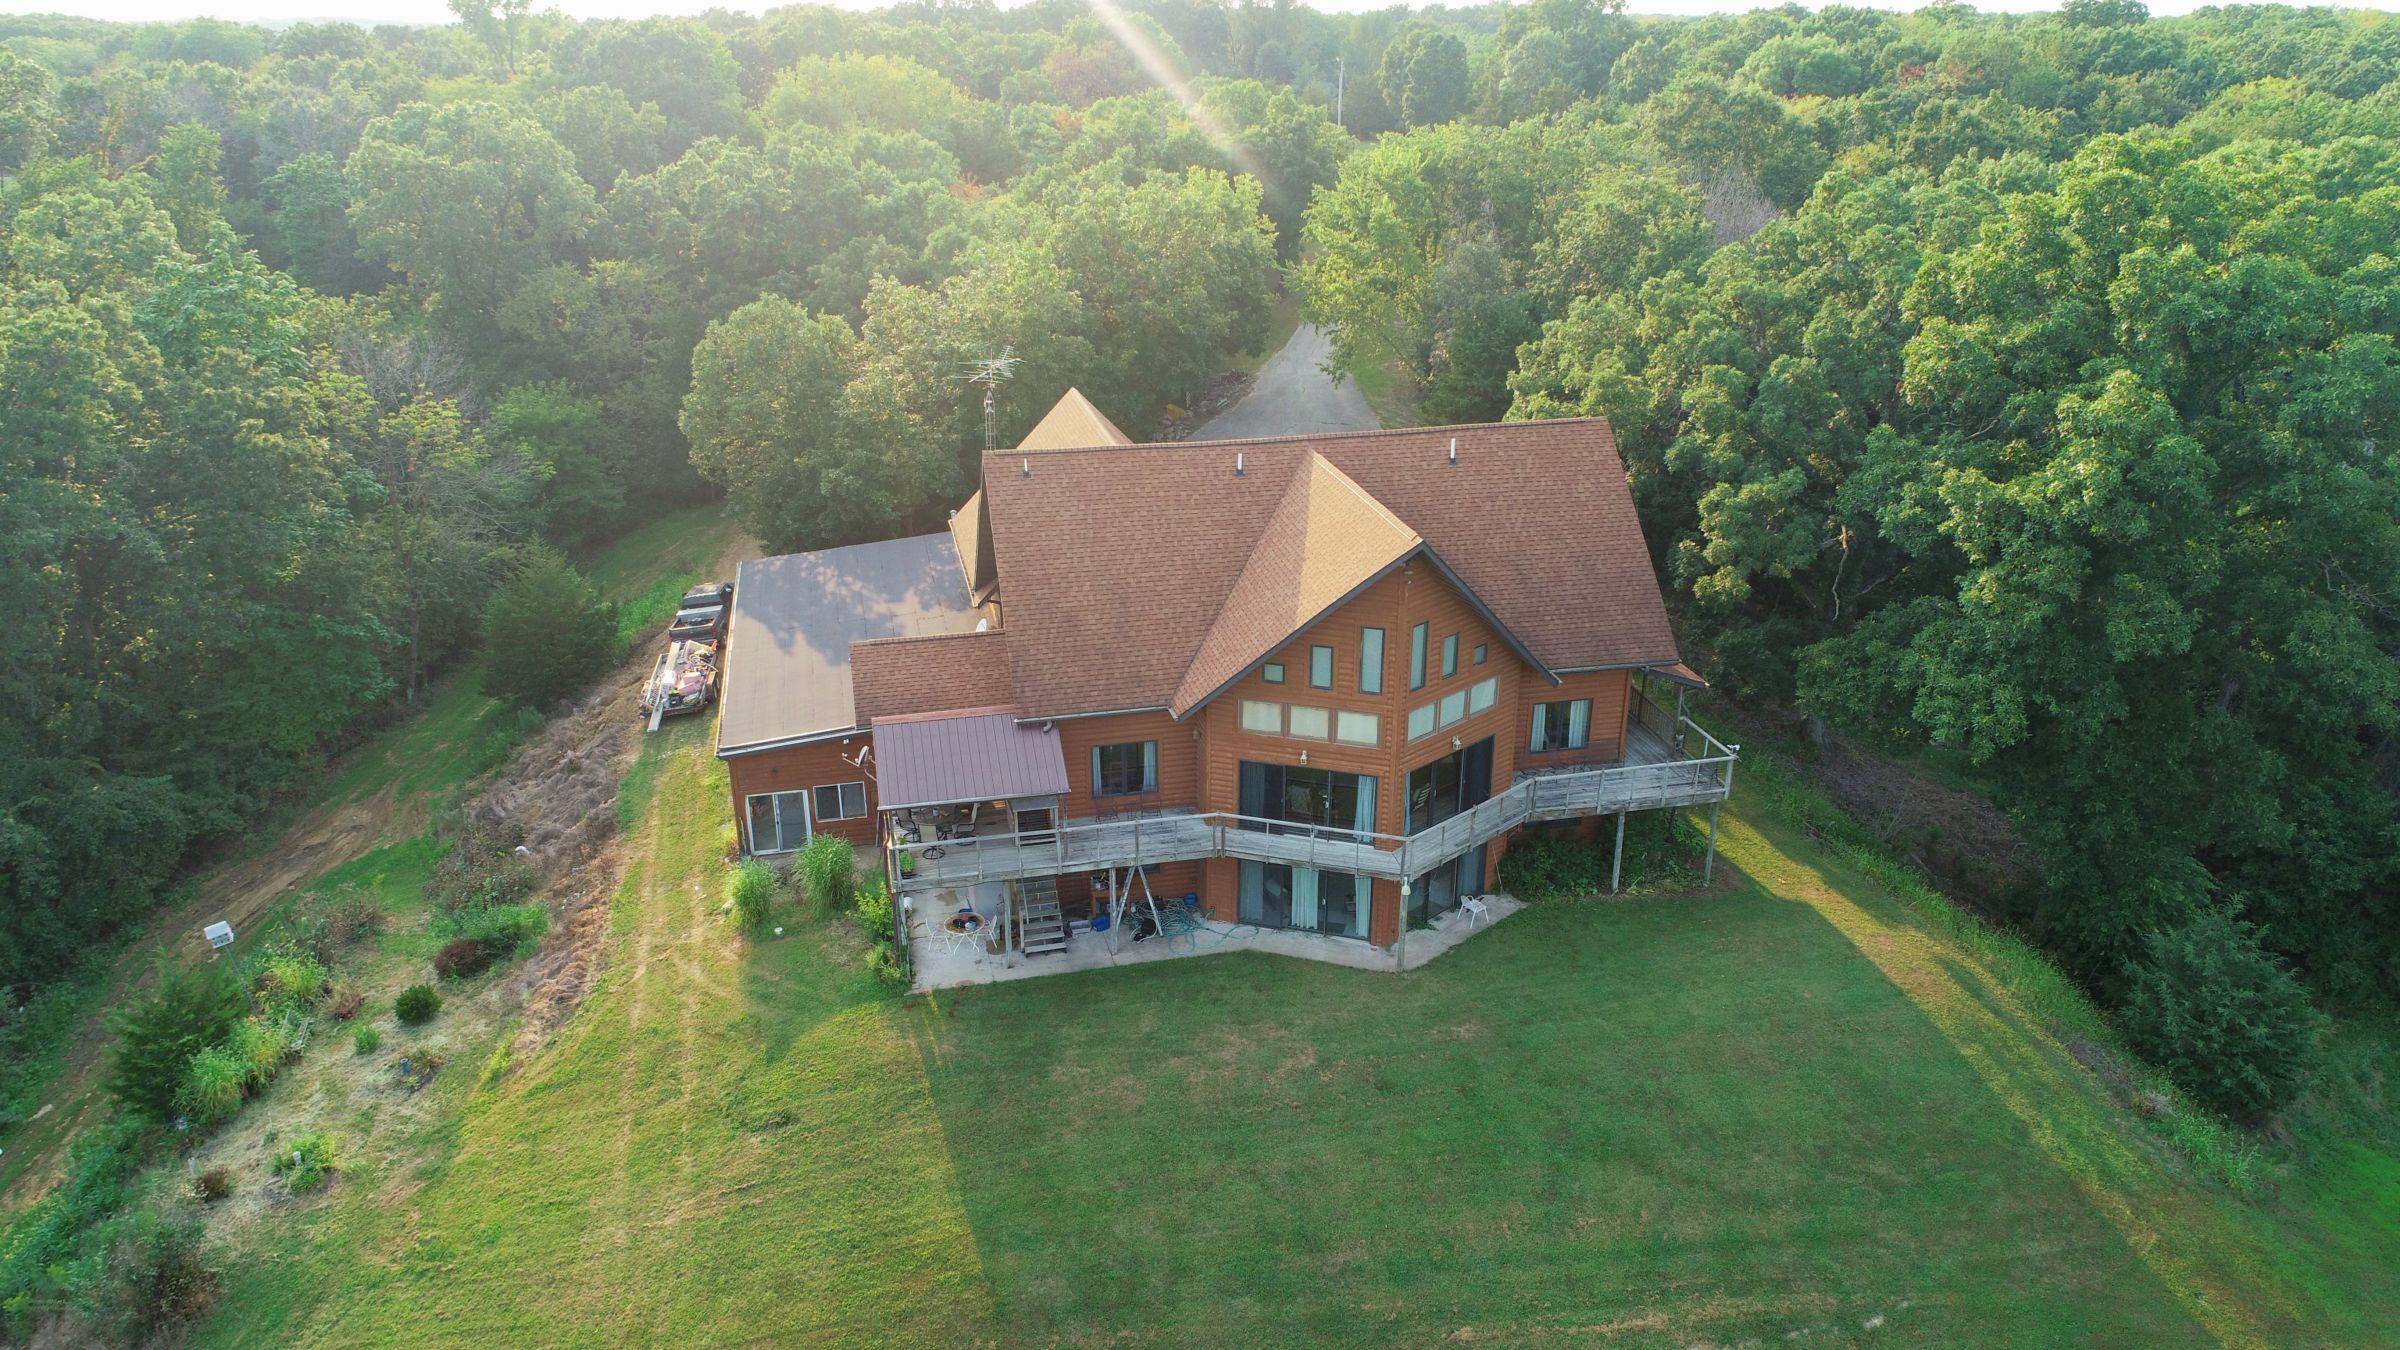 land-lee-county-iowa-328-acres-listing-number-15137-8-2020-08-27-174902.jpg